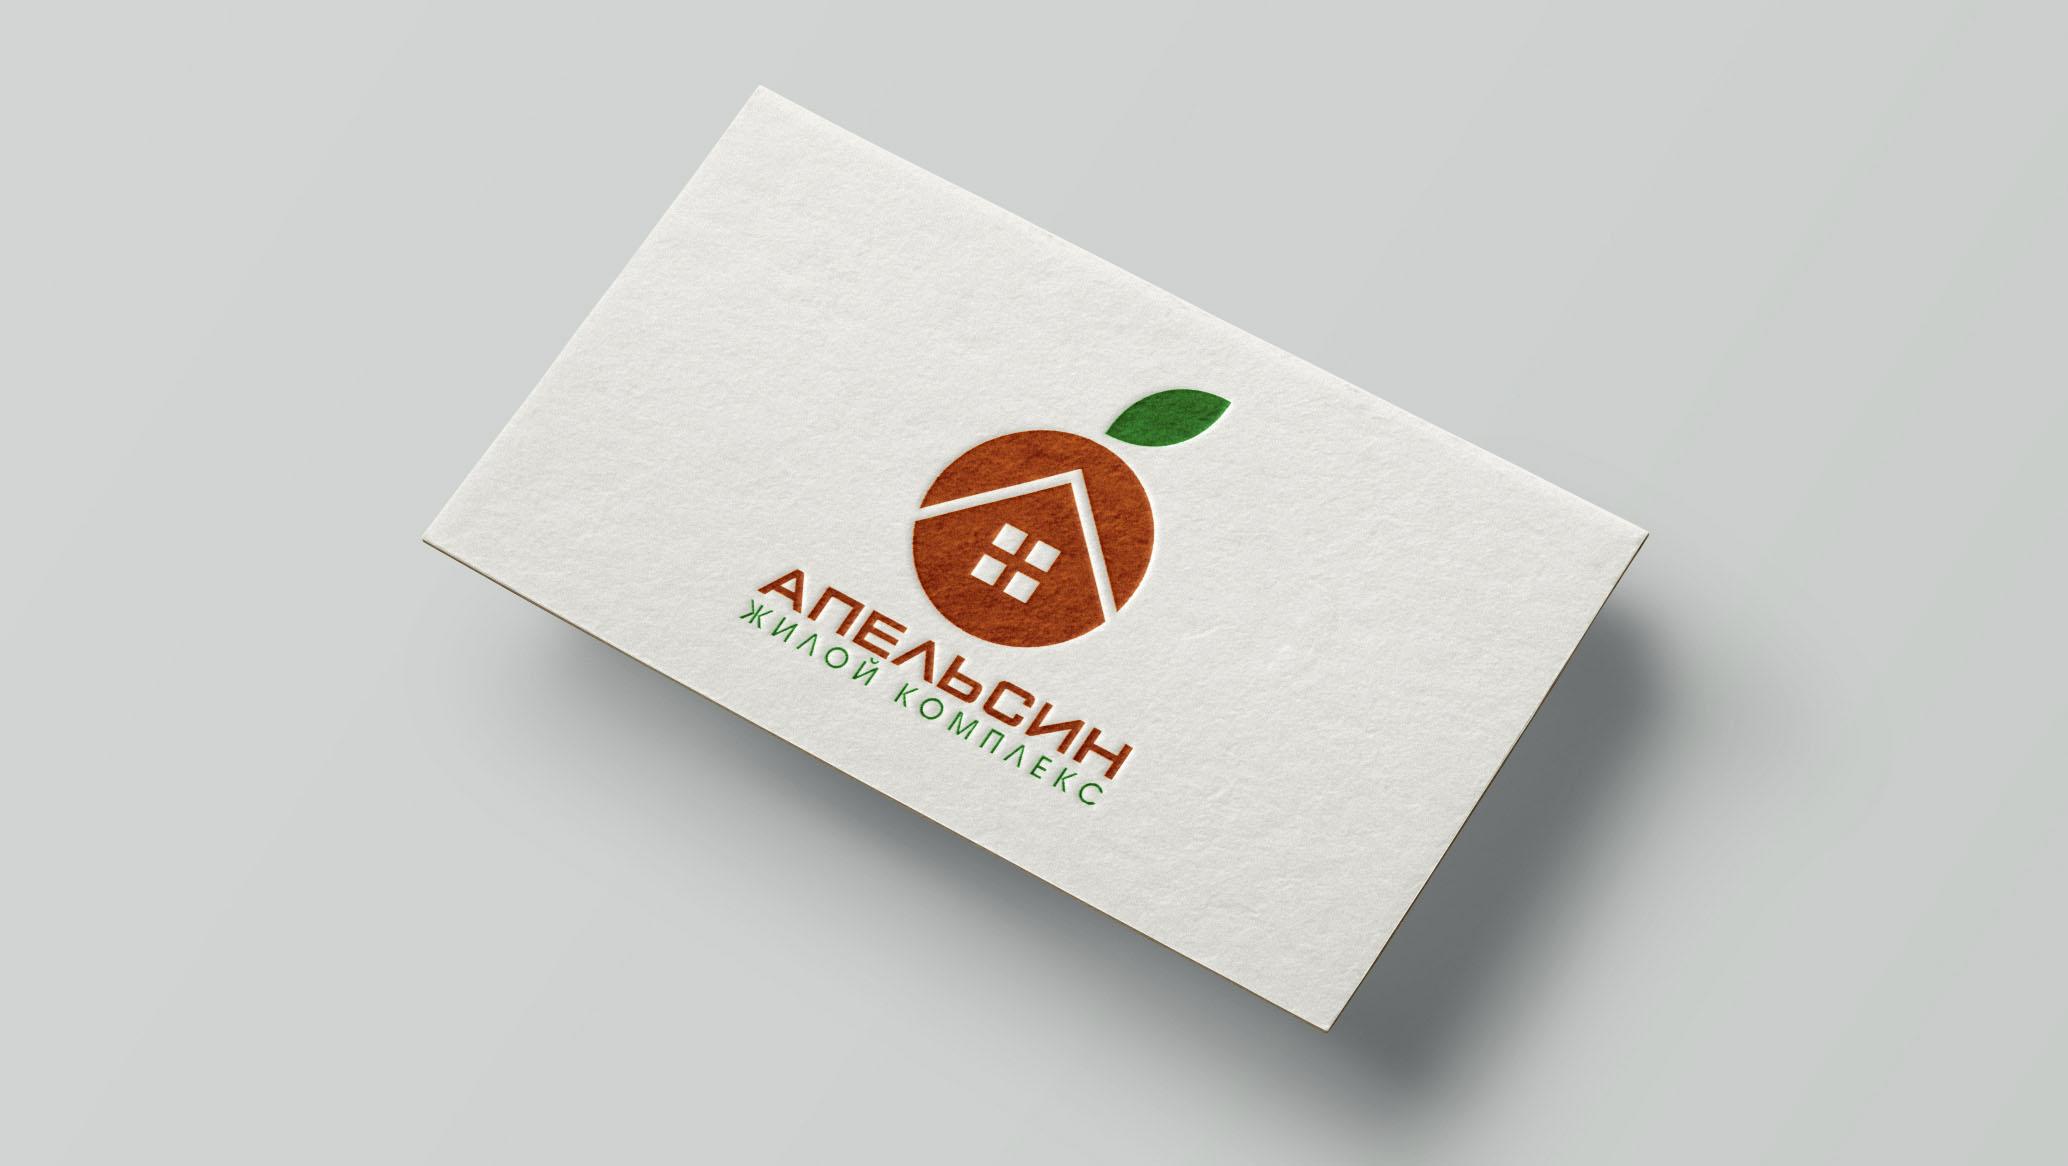 Логотип и фирменный стиль фото f_9605a59d44cbf92c.jpg